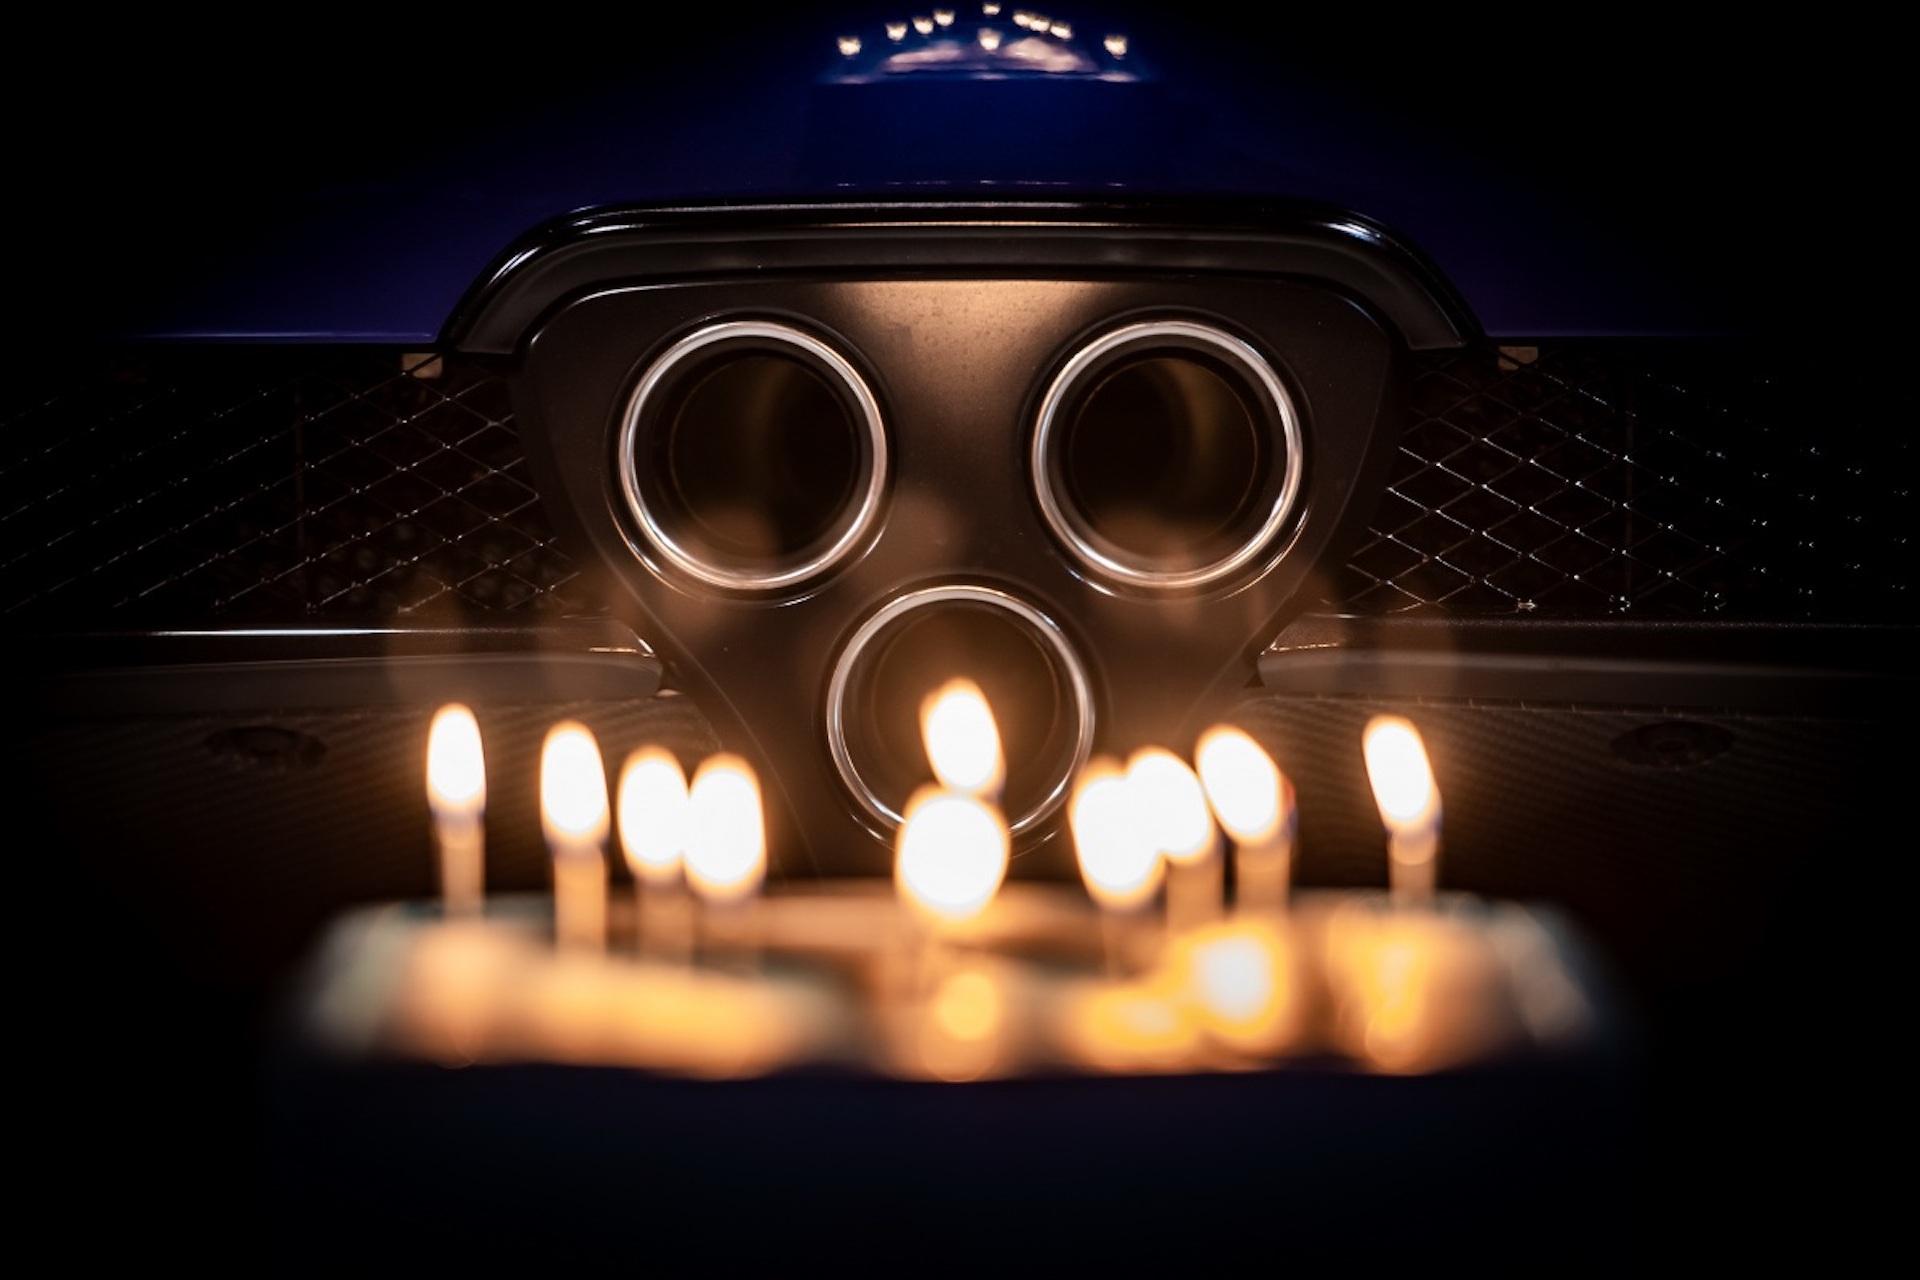 Lexus Lfa 10 Aniversario 3